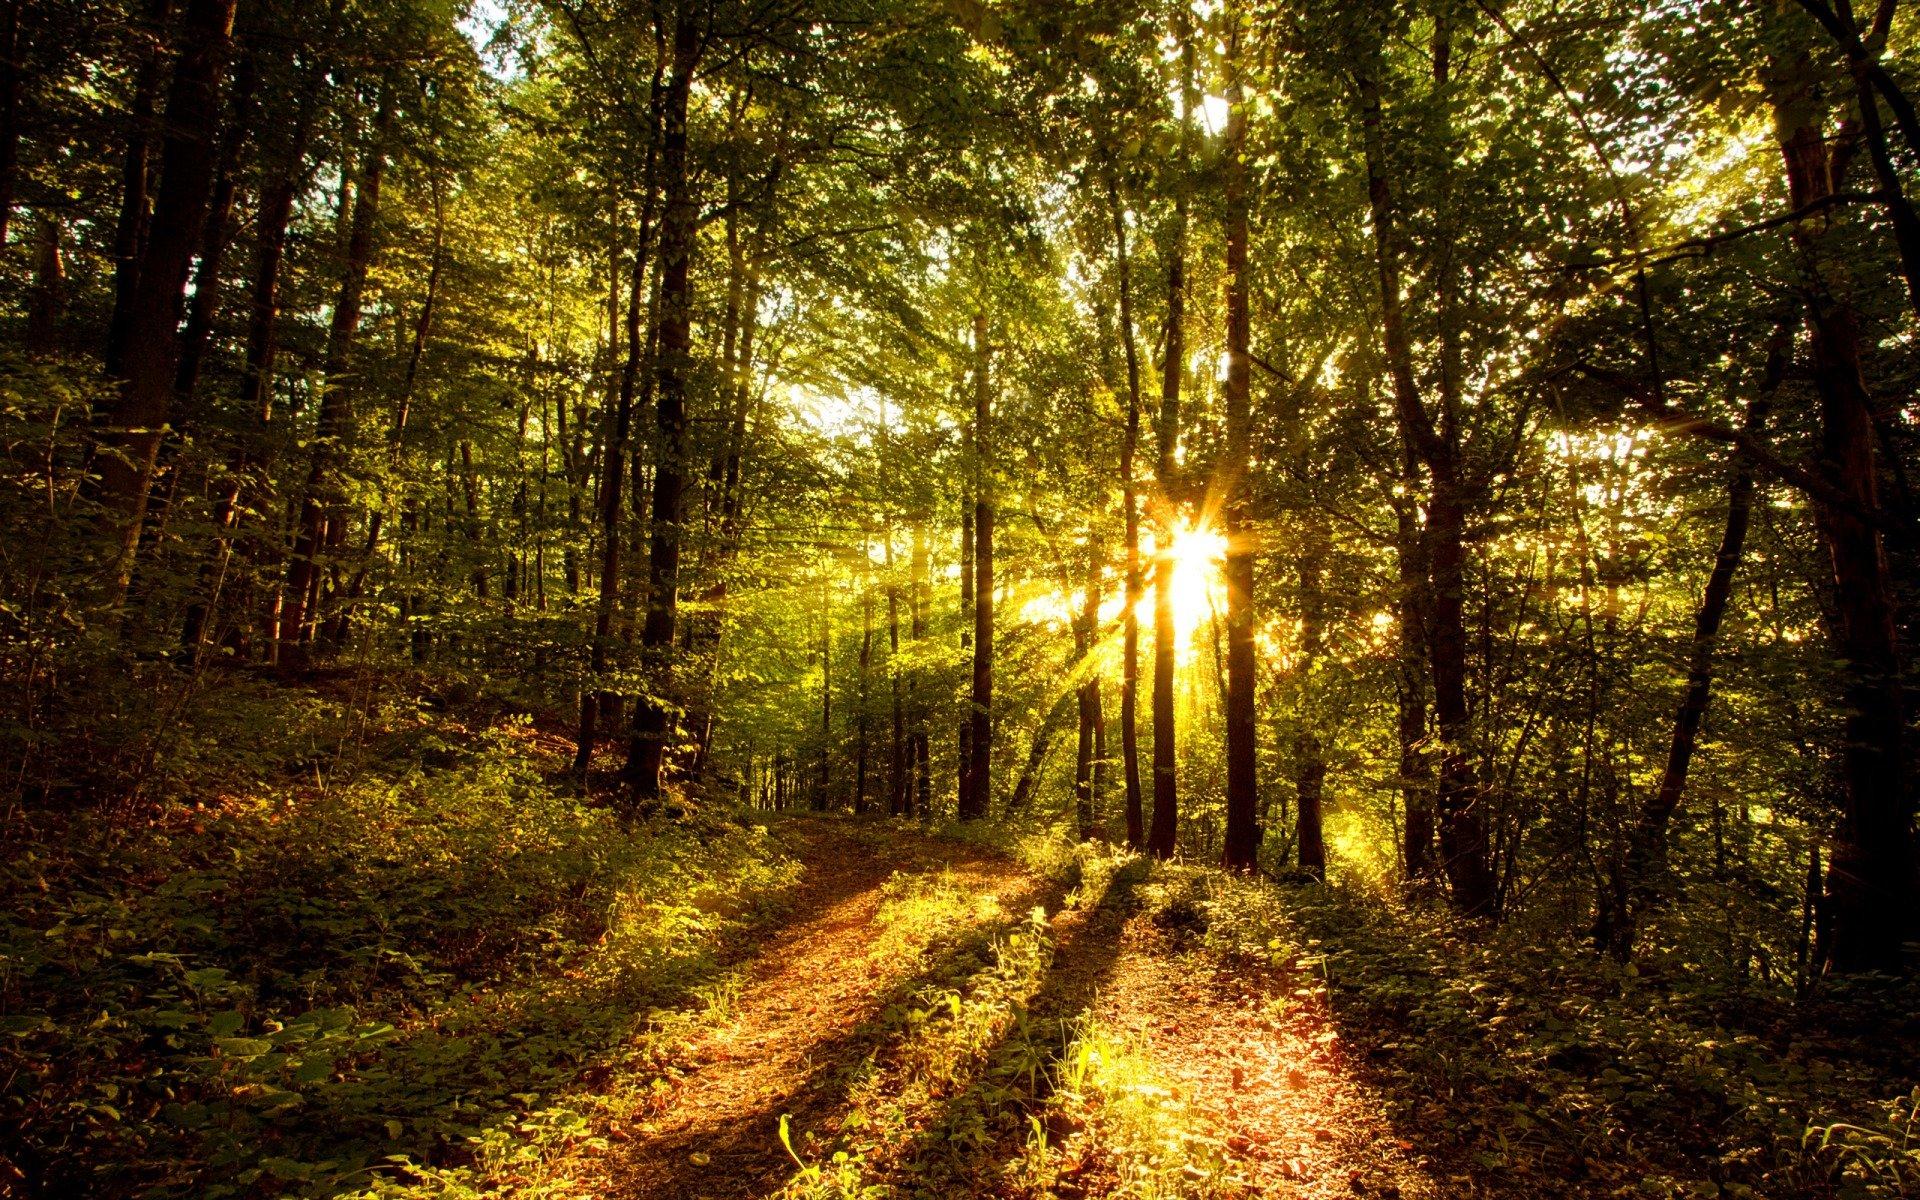 Forest Sun wallpaper - Nature wallpapers - Free wallpapers, Desktop wallpapers, Computer backgrounds